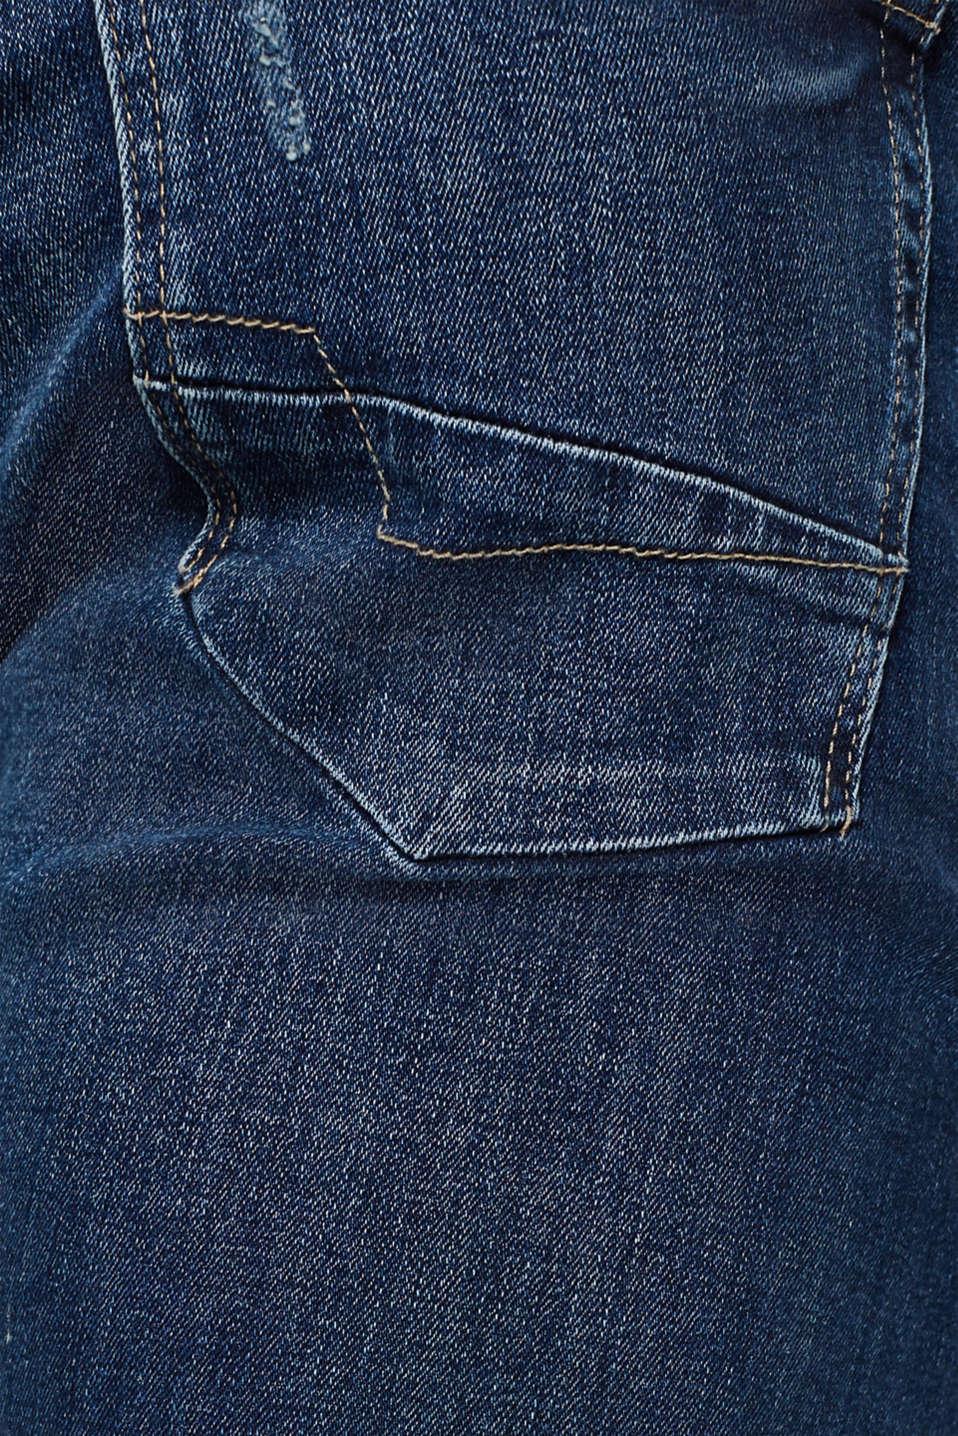 Pants denim Straight fit, BLUE MEDIUM WASH, detail image number 4